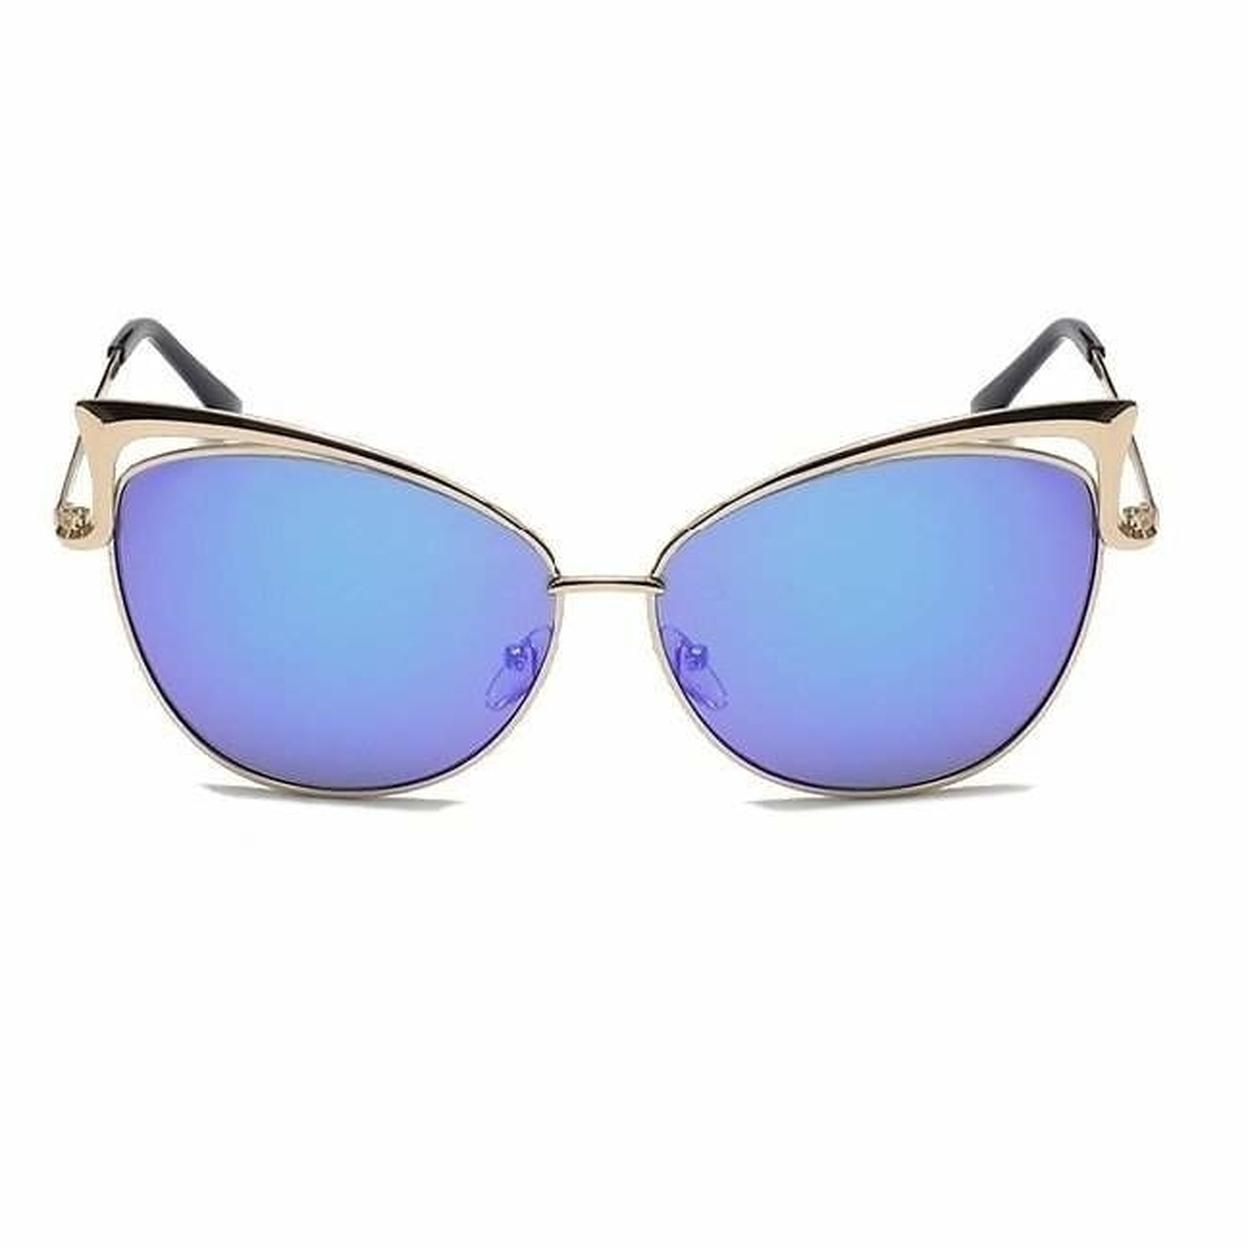 Gold Retro Cat Eye Sunglasses 59f5f4a0e224615b8566b8fe